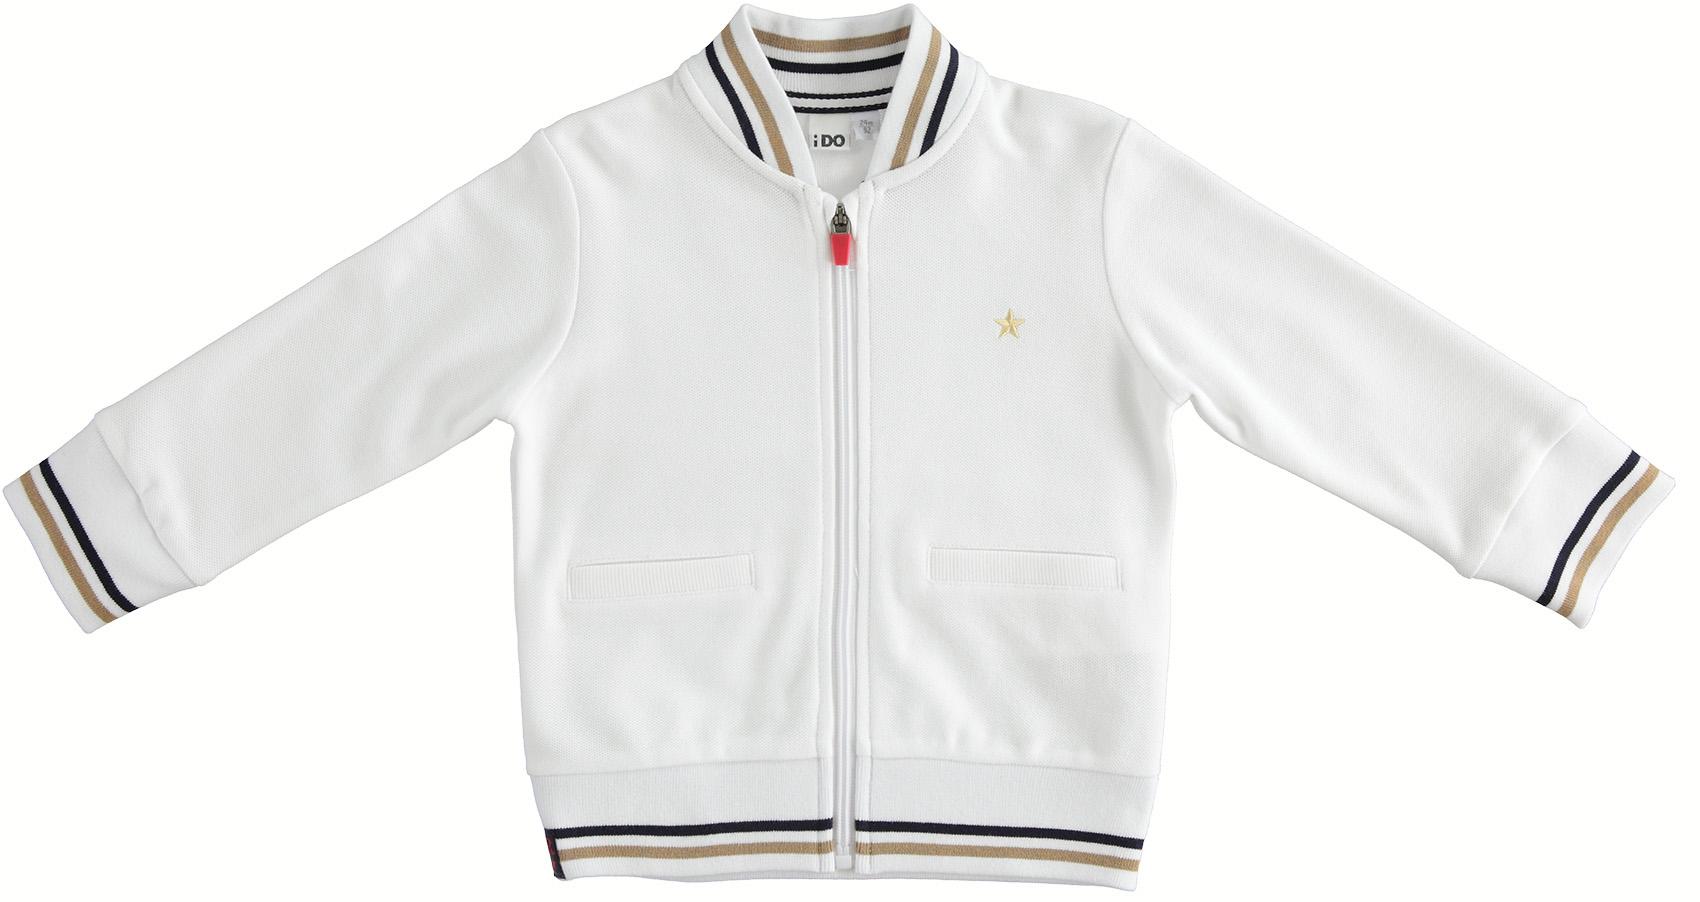 Fehér cipzáros pulóver kisfiúknak